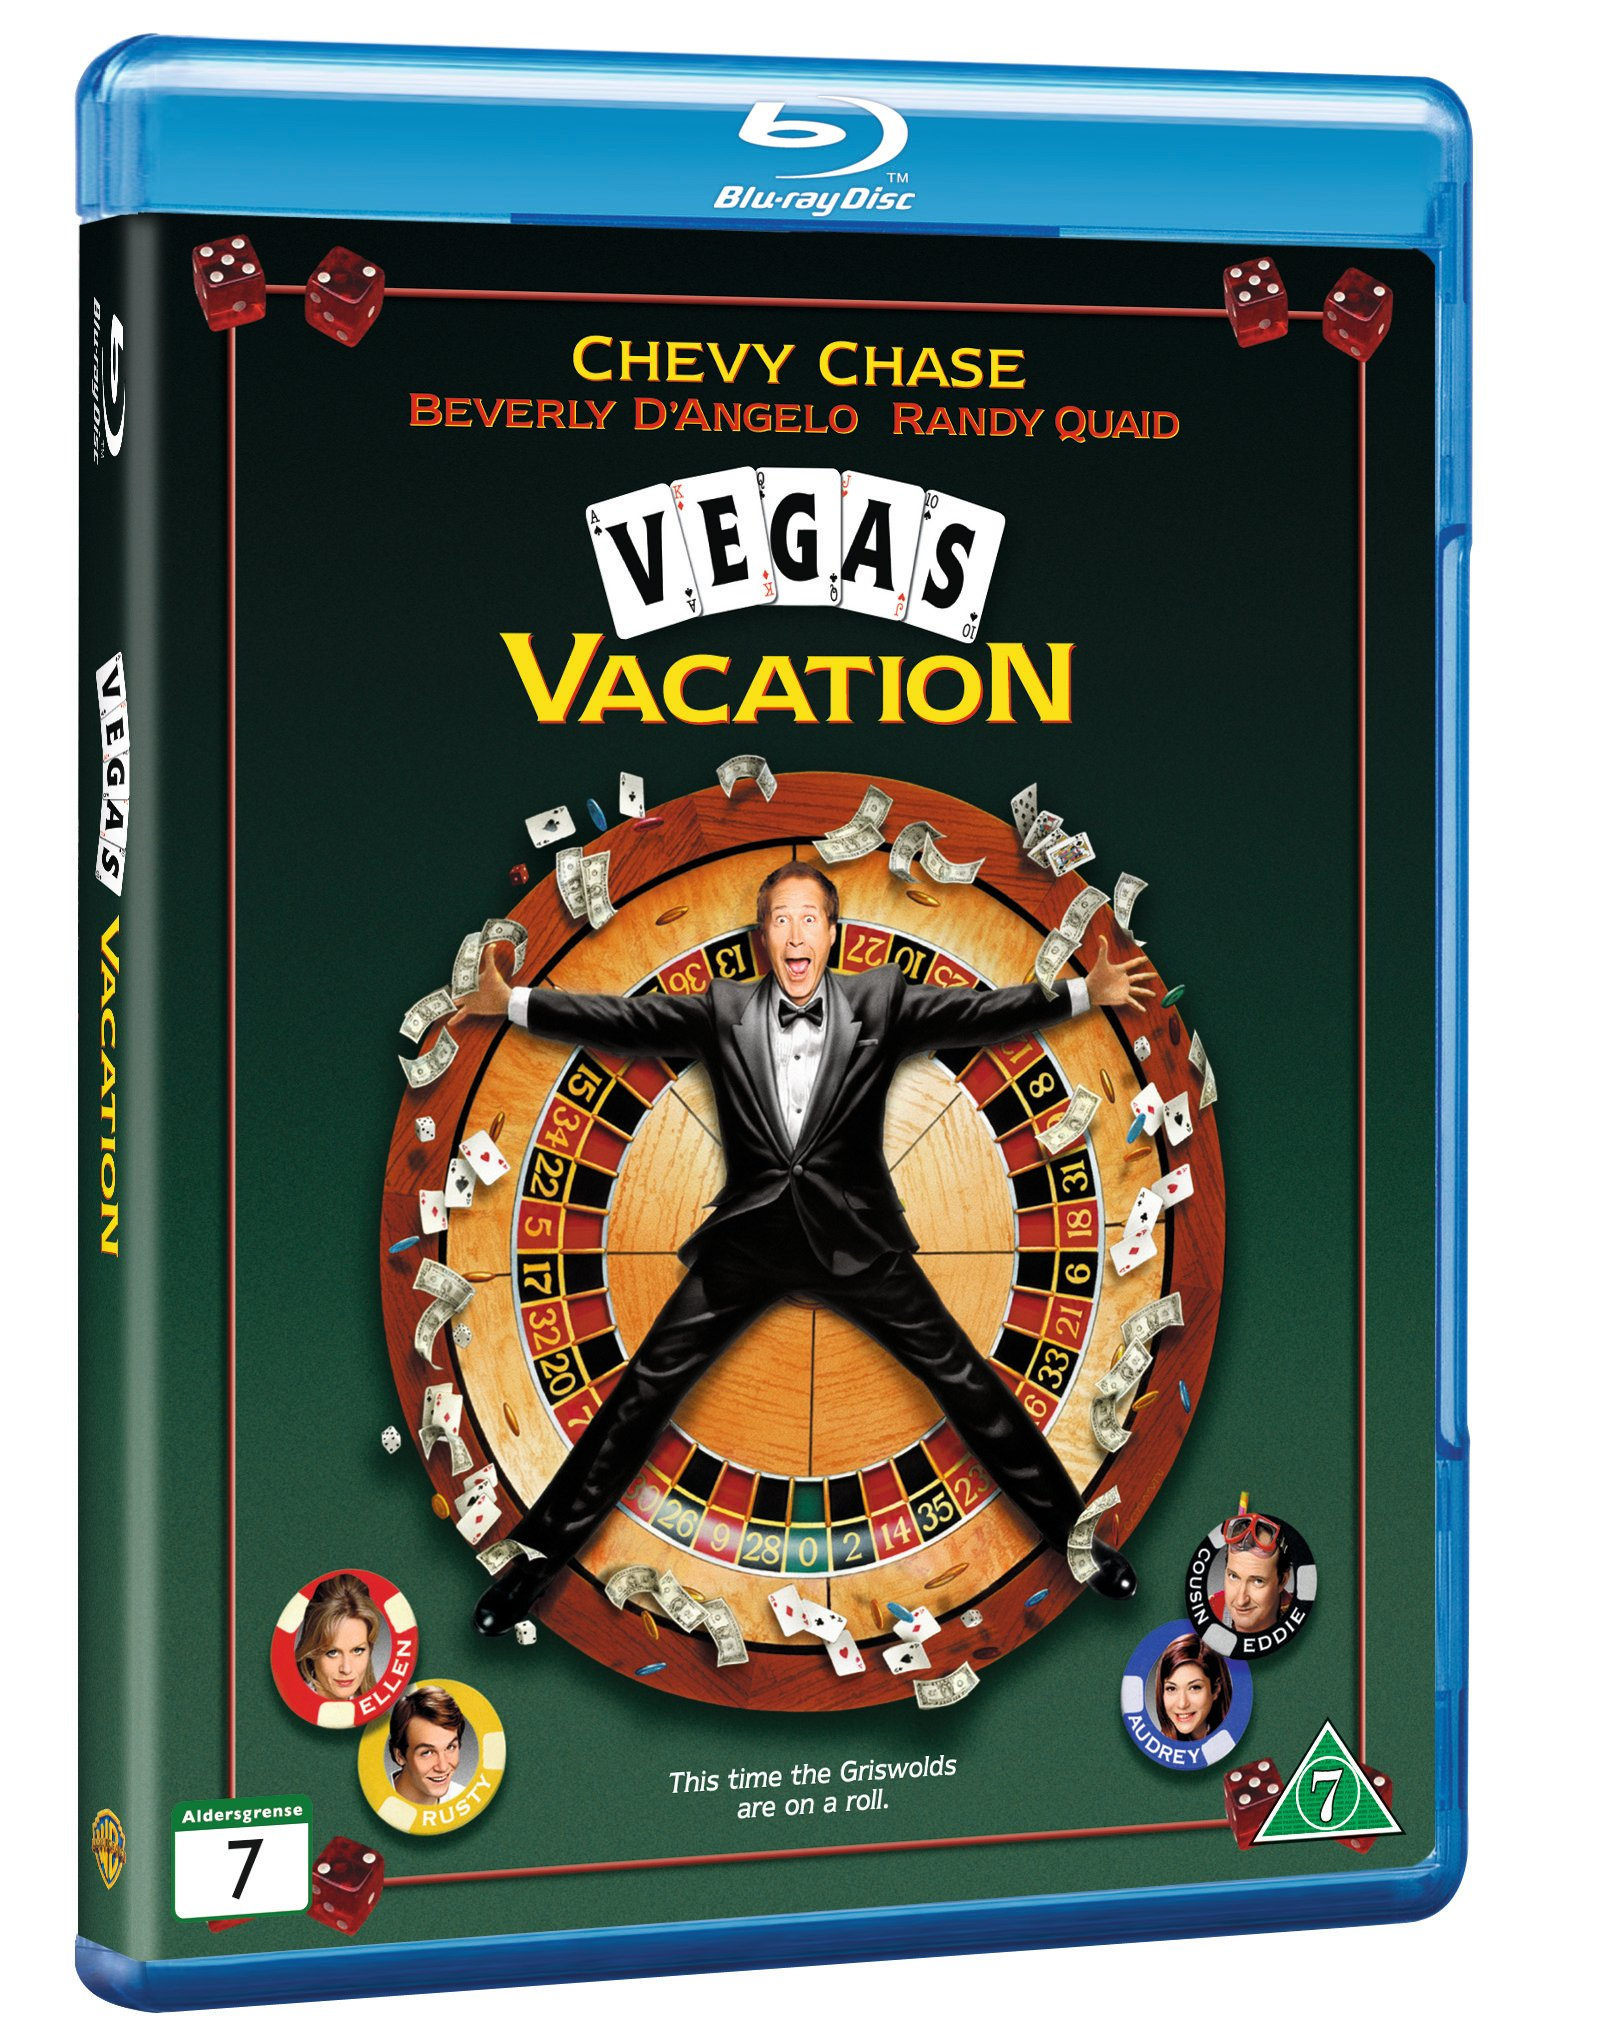 NL's Vegas Vacation - Blu Ray